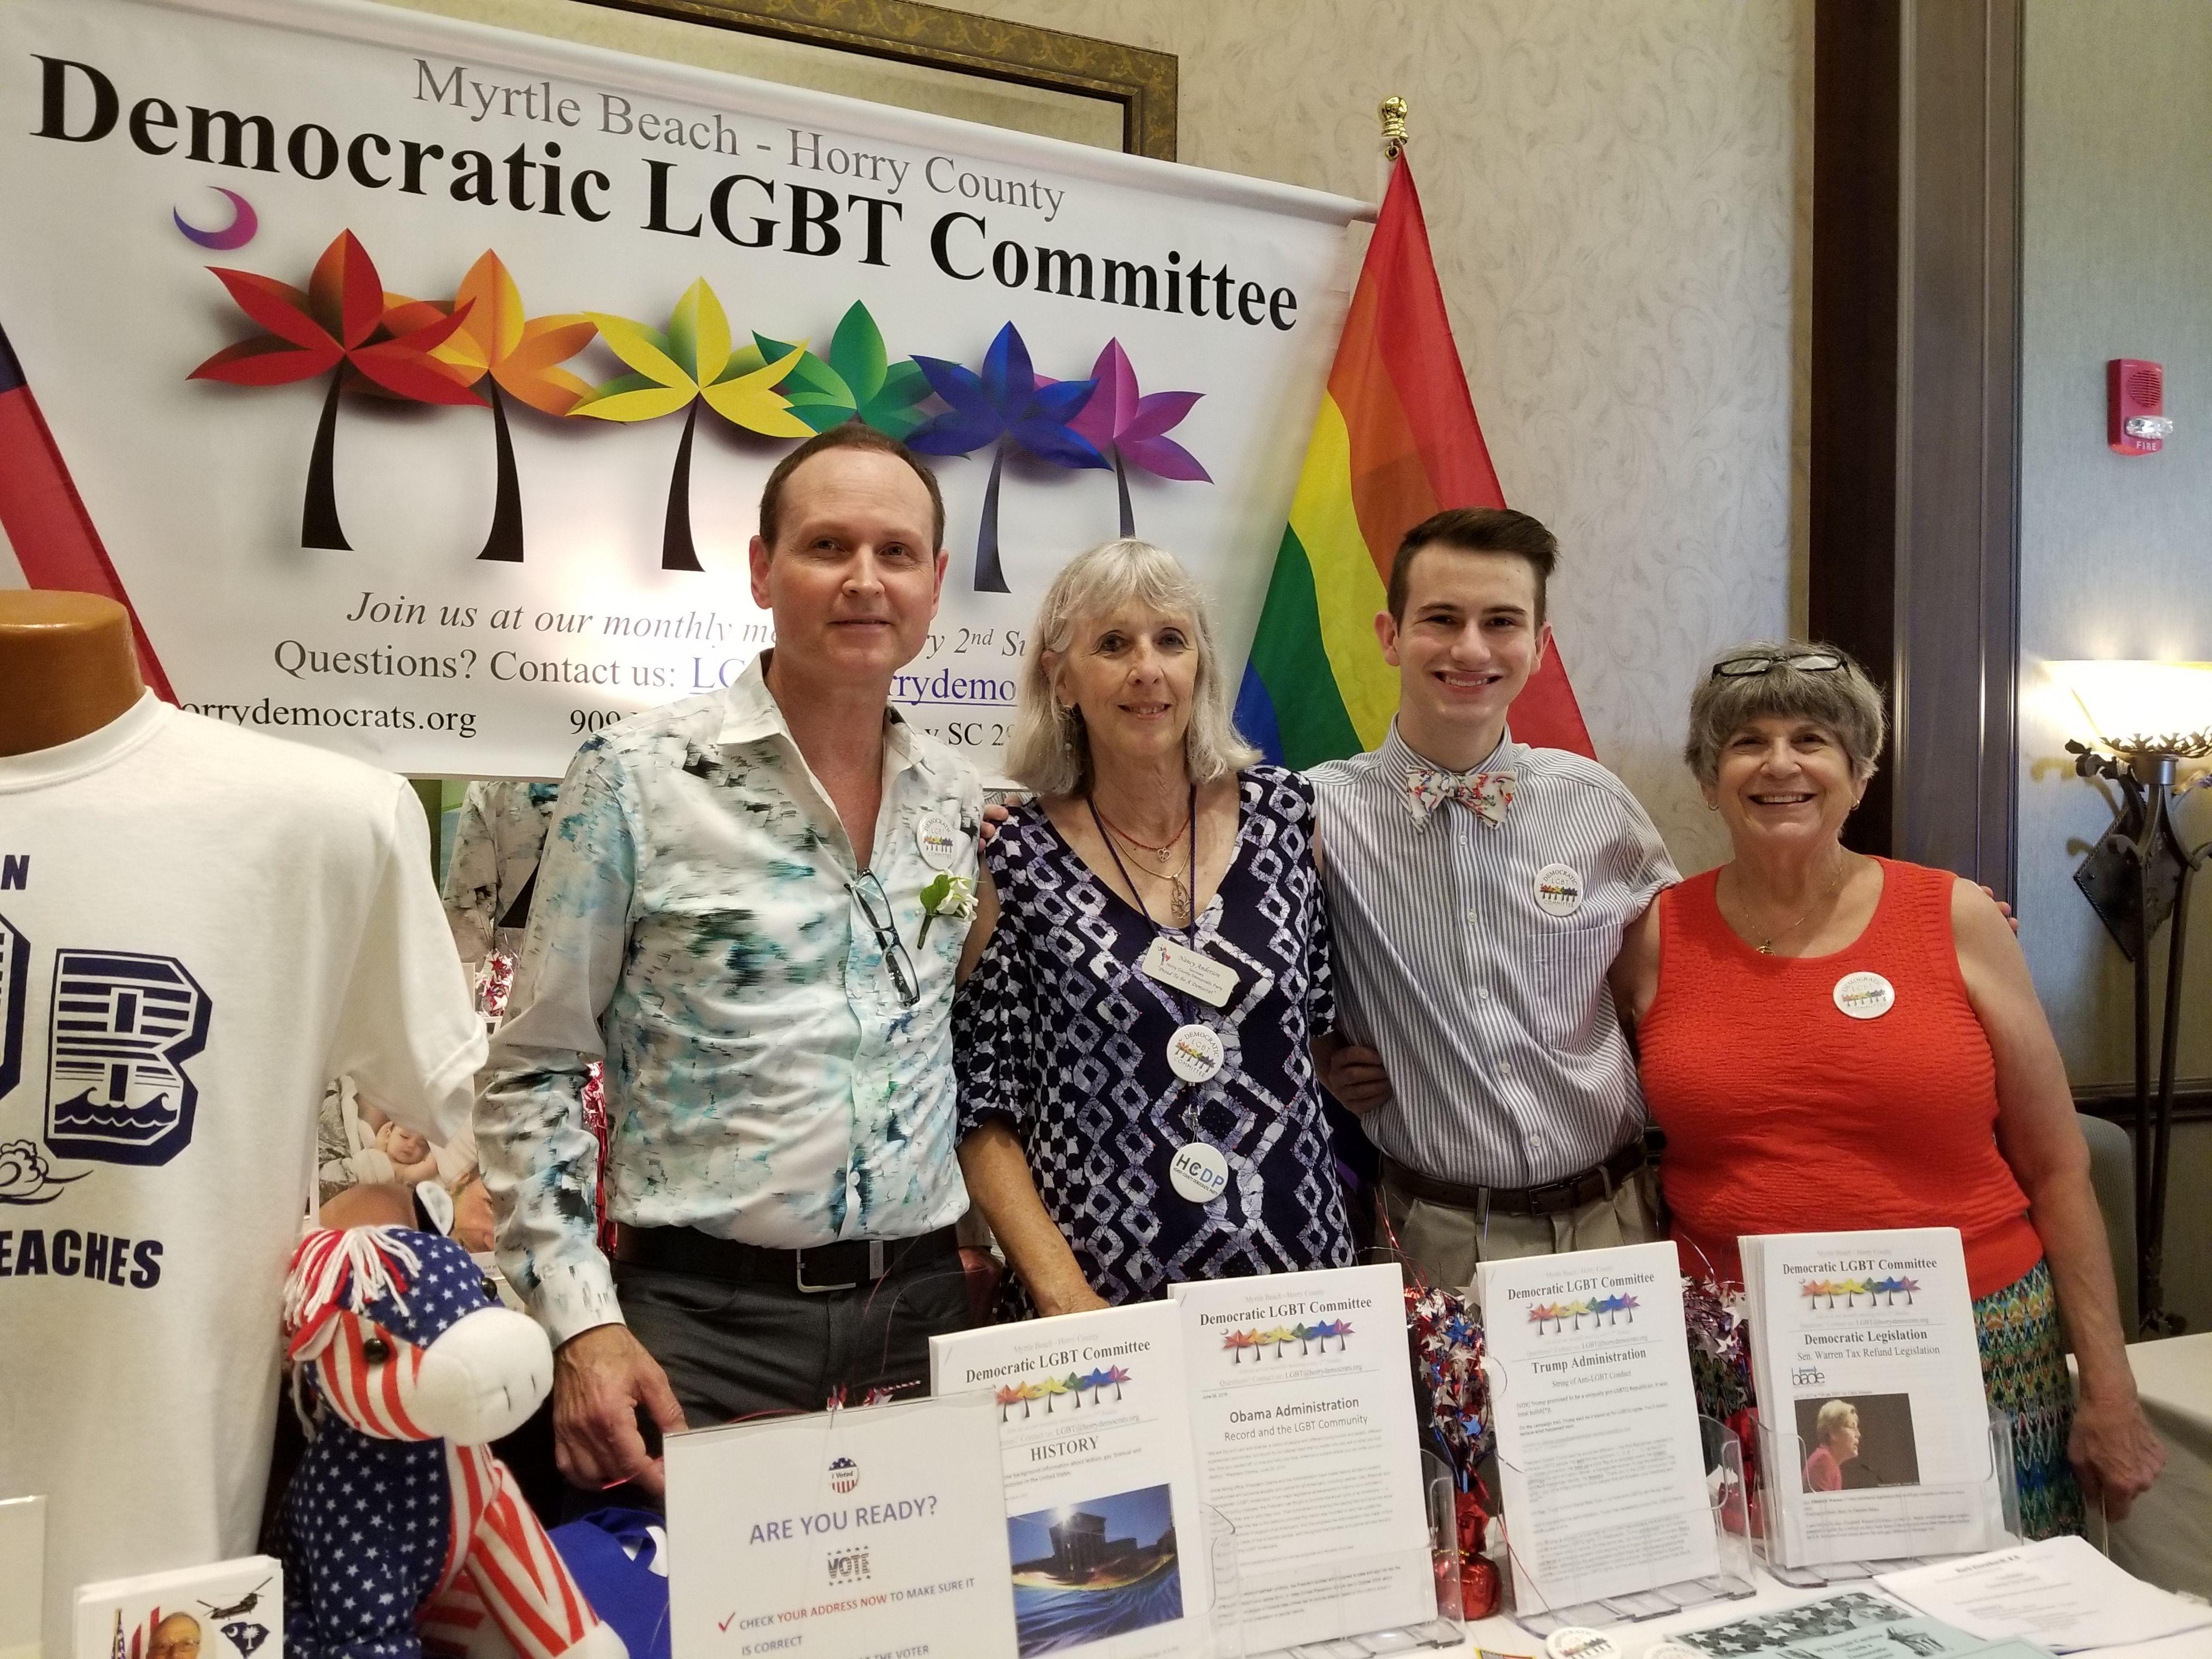 Democratic LGBT Committee of Myrtle Beach